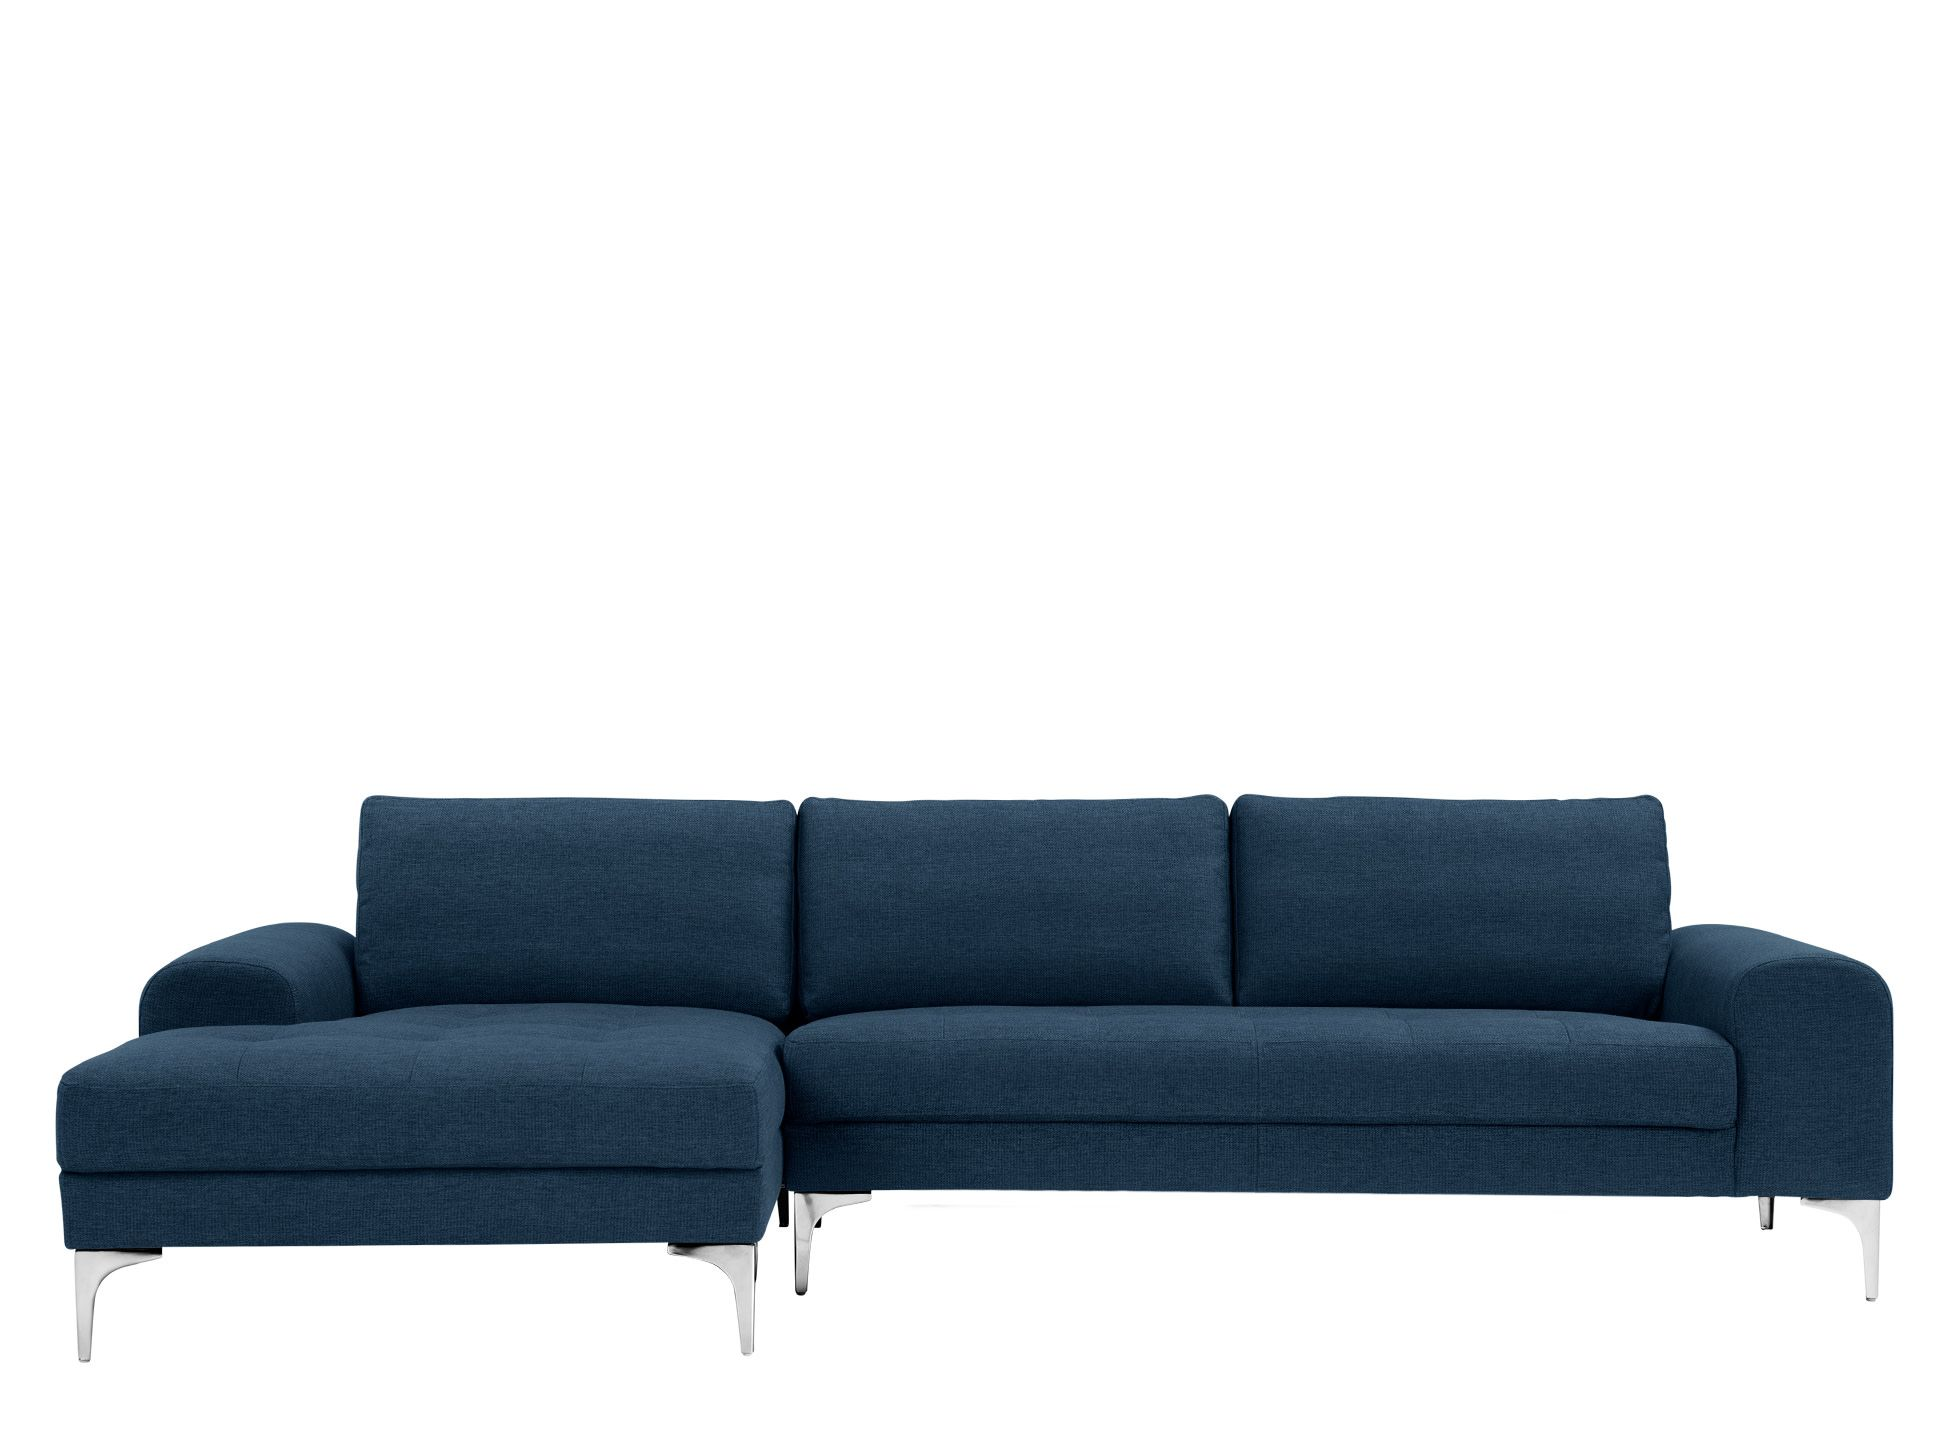 Vittorio Left Hand Facing Chaise End Corner Sofa Scuba Blue Corner Sofa Corner Sofa Bed Sofa